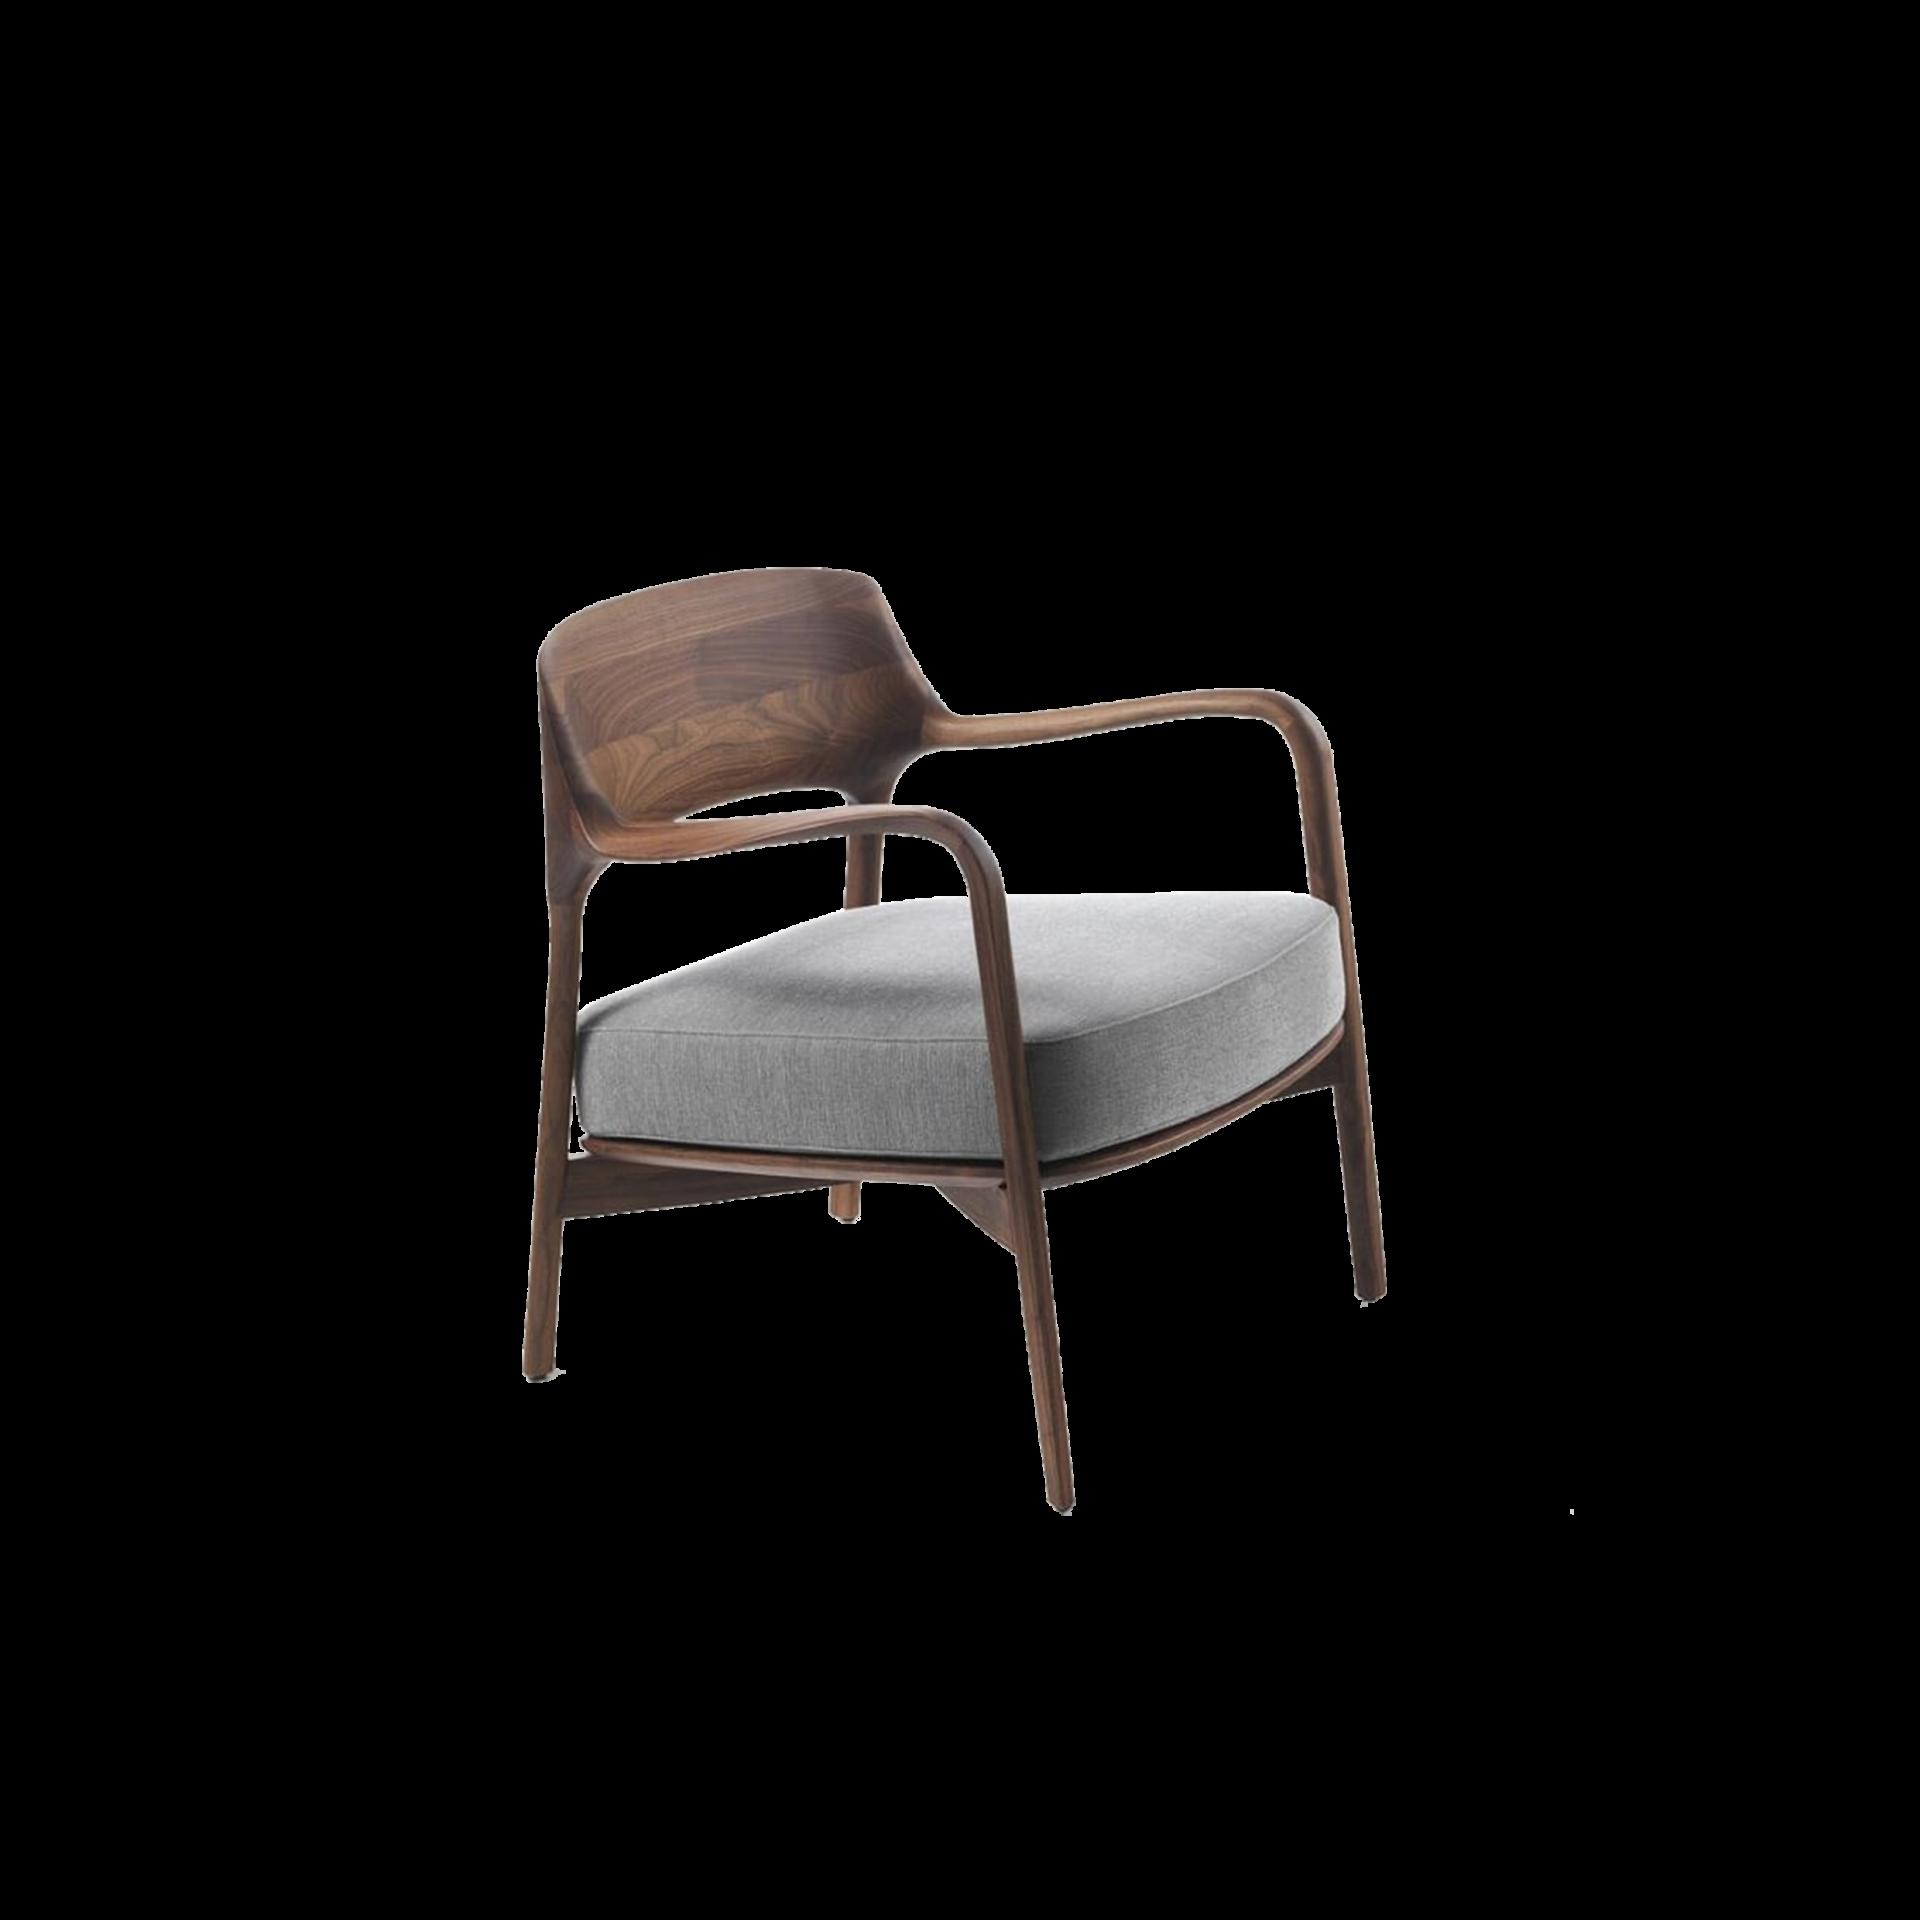 Louis Chair - Patrick Jouin, Porada